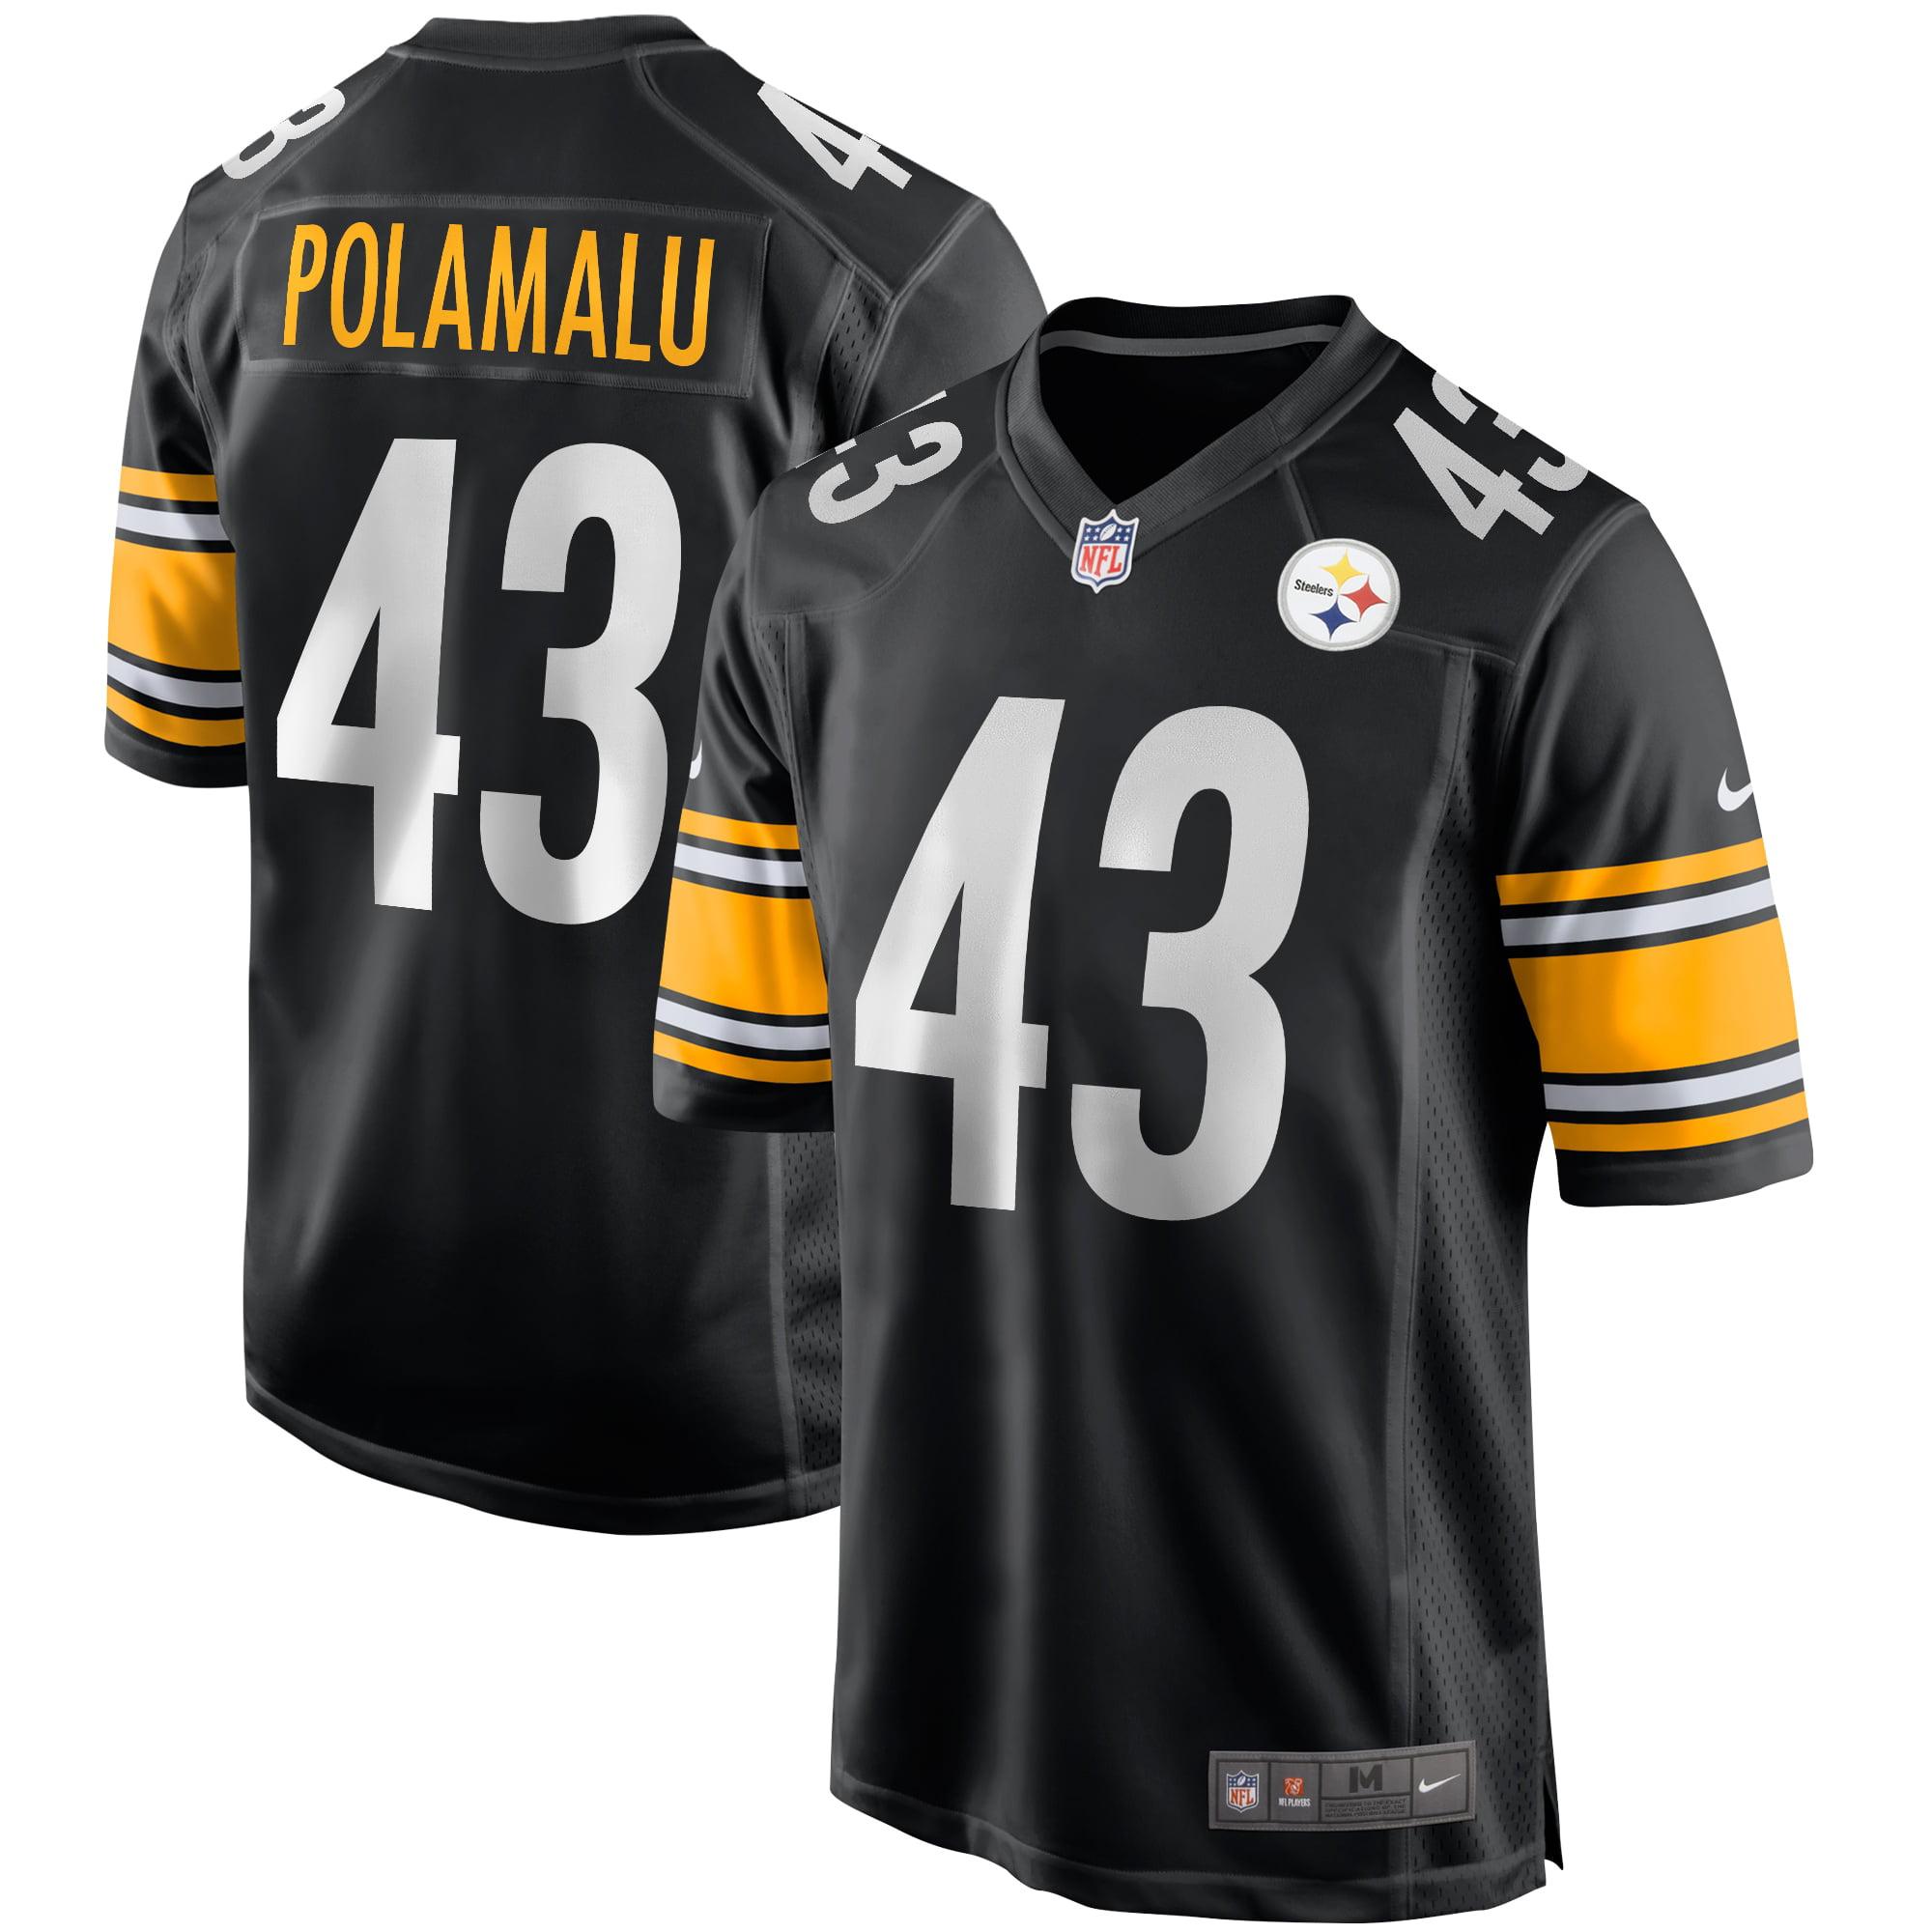 Troy Polamalu Pittsburgh Steelers Nike Game Retired Player Jersey - Black